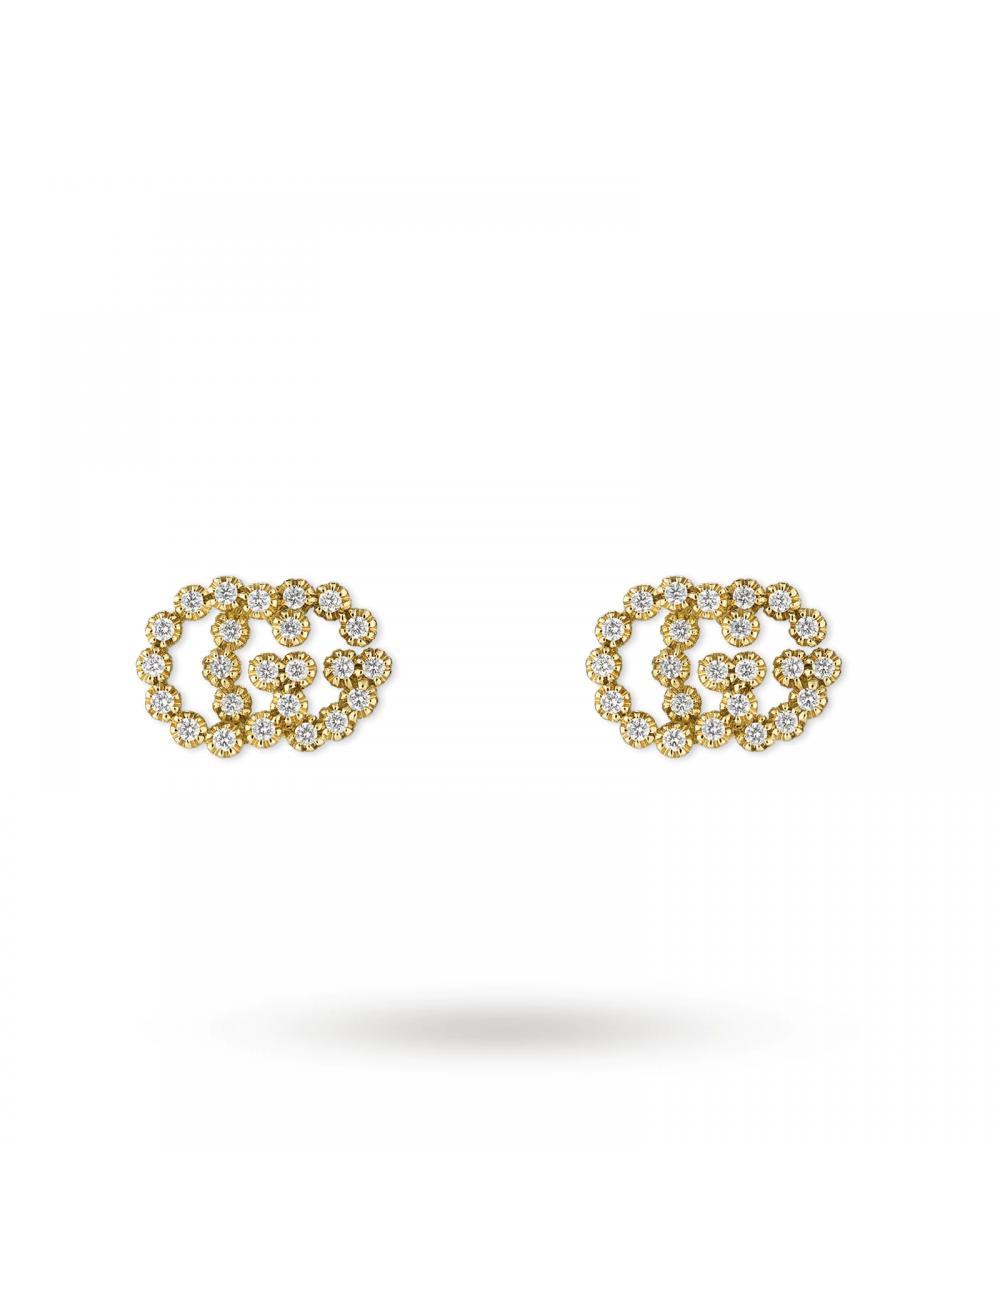 Gucci -Pendientes Gucci GG Running de oro amarillo -YBD48167600100U